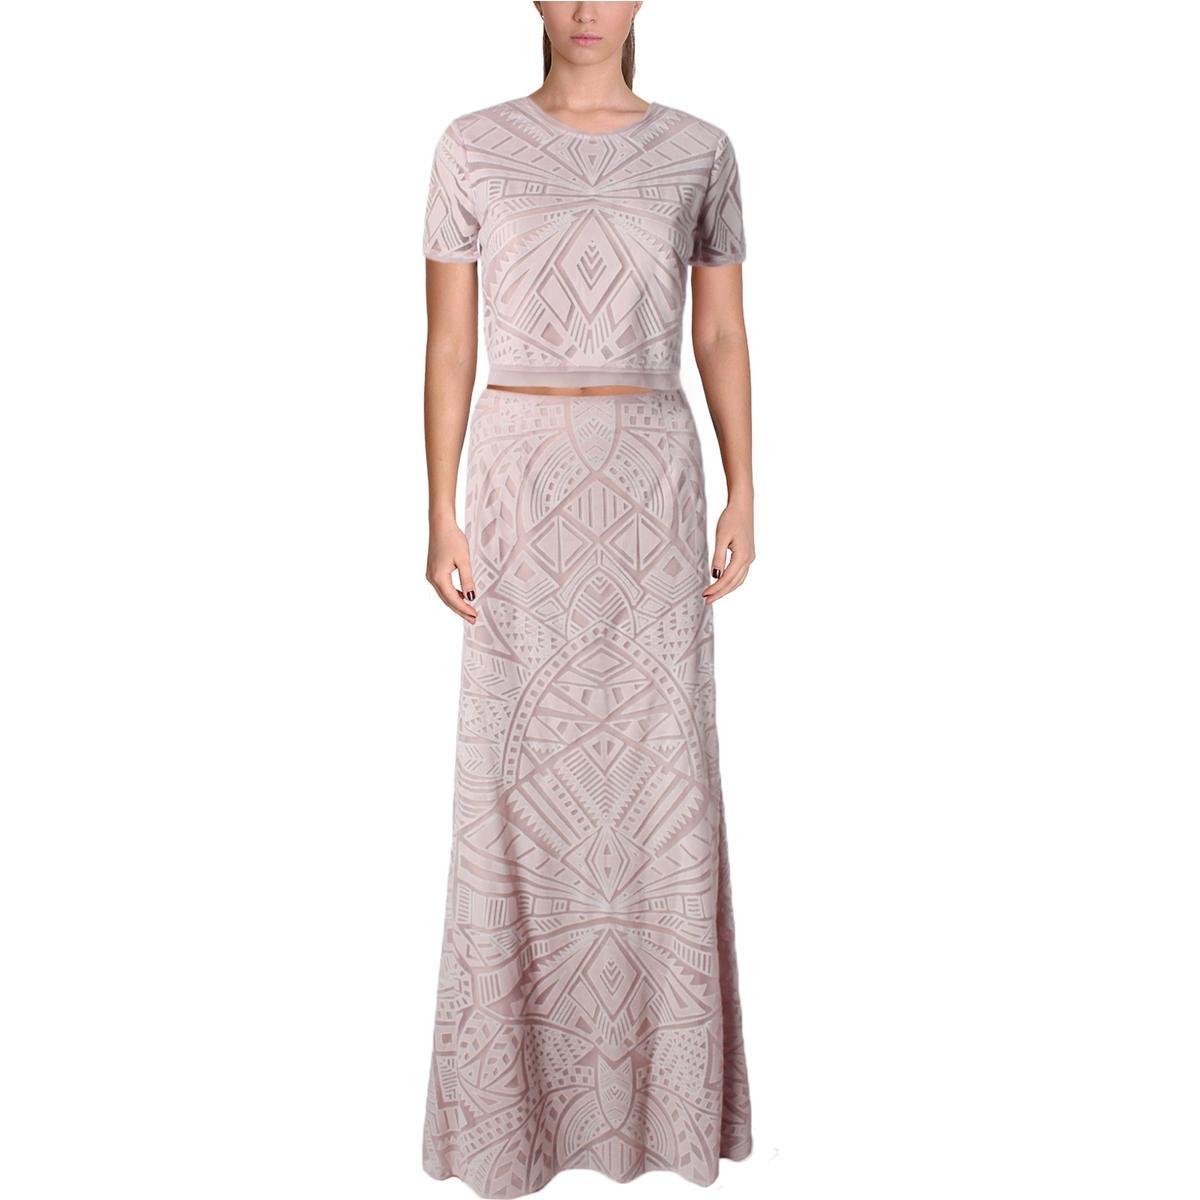 BCBG Max Azria Womens Maris Lace Illusion Crop Top Dress Pink 0